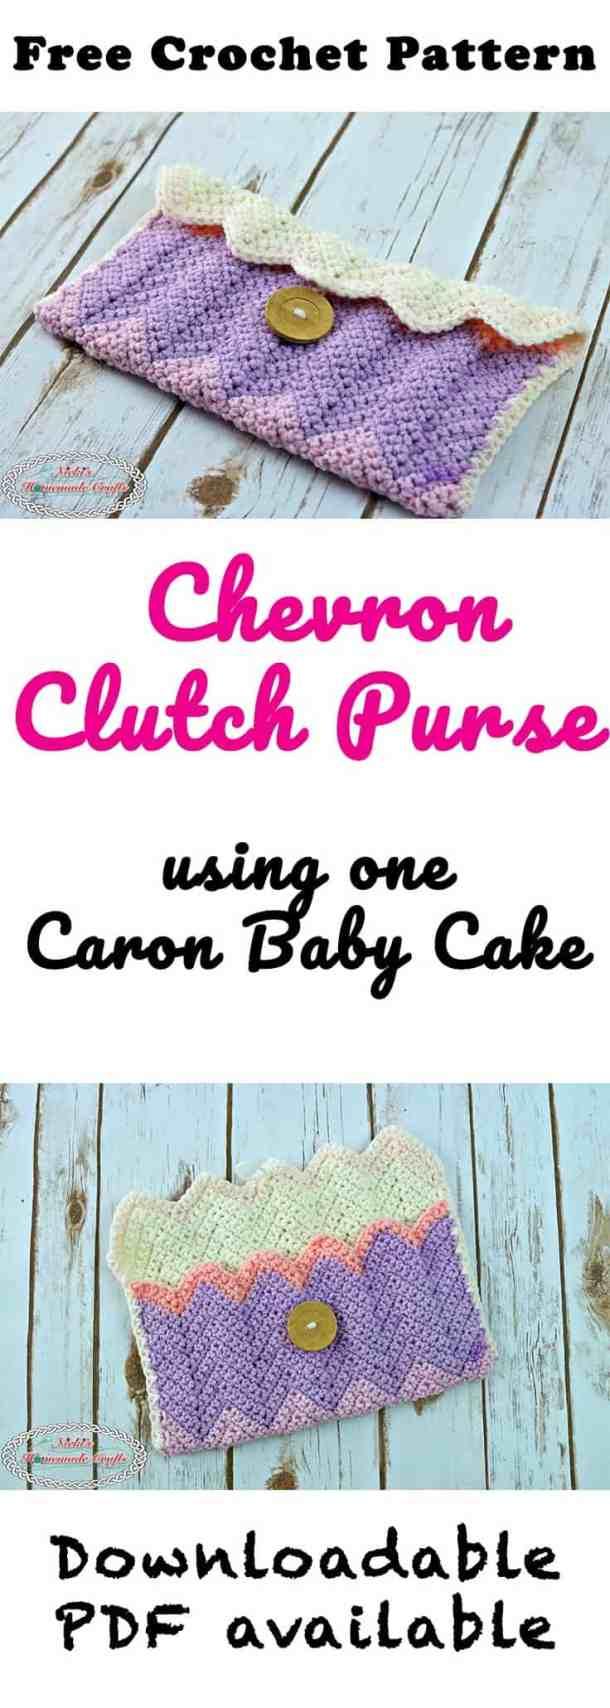 Chevron Clutch Purse - Free Crochet Pattern by Nicki's Homemade Crafts #crochet #chevronstitch #clutch #purse #freecrochetpattern #crochetpattern #caronbabycake #caroncake #caron